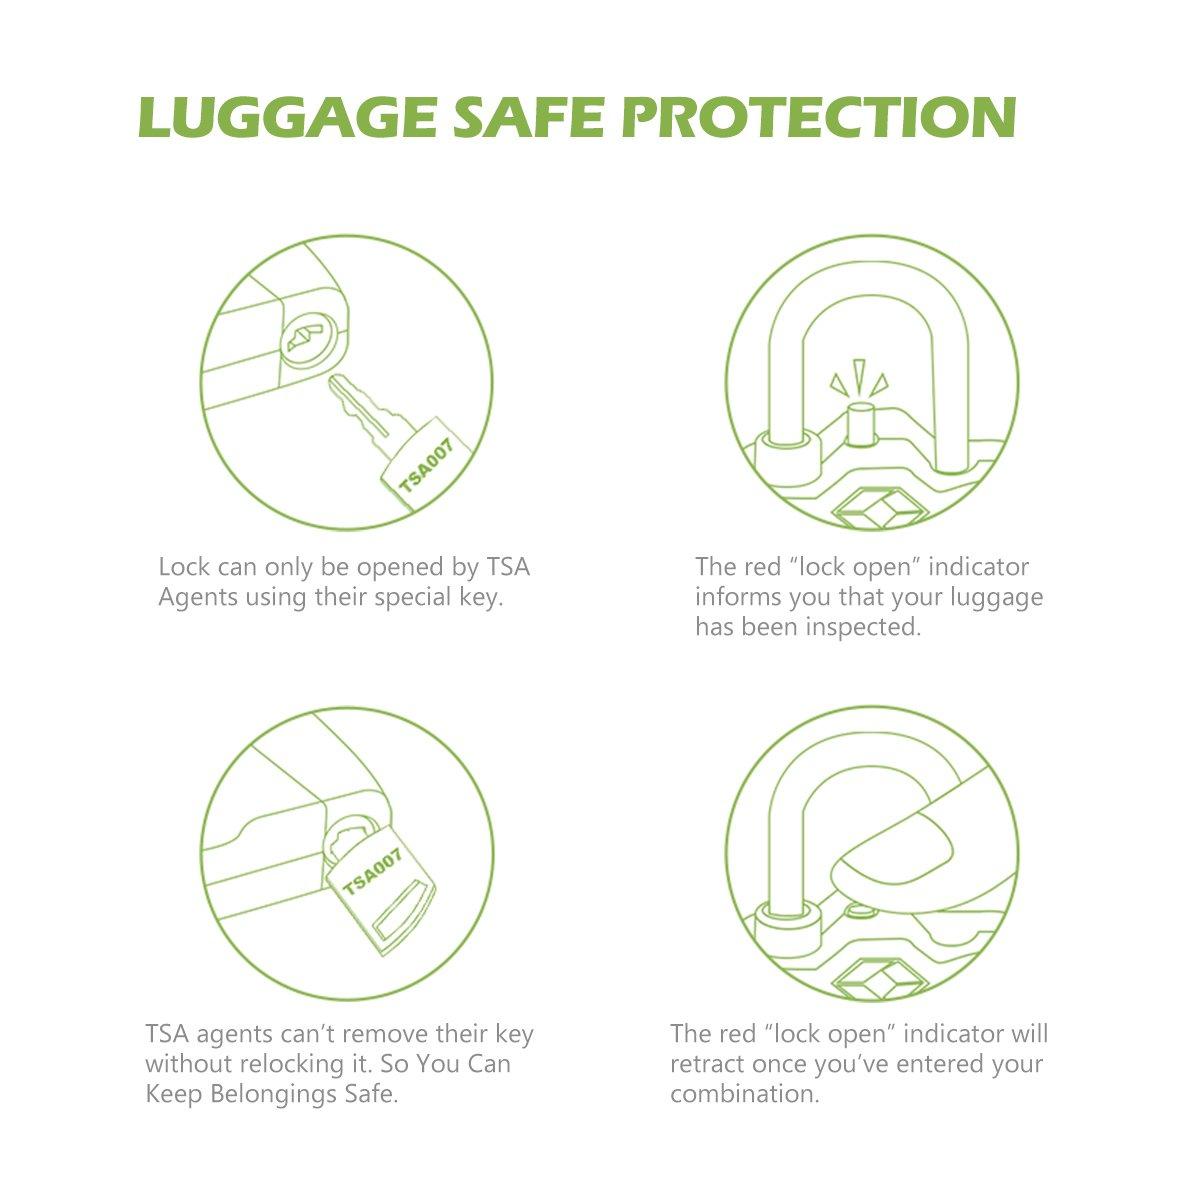 KeeKit Combination Locks, TSA Approved Luggage Locks with Open Alert Indicator, TSA Luggage Locks for Travel, Suitcase, Baggage & Backpack, Gym Locker (Black, 2 Pack) by KeeKit (Image #6)